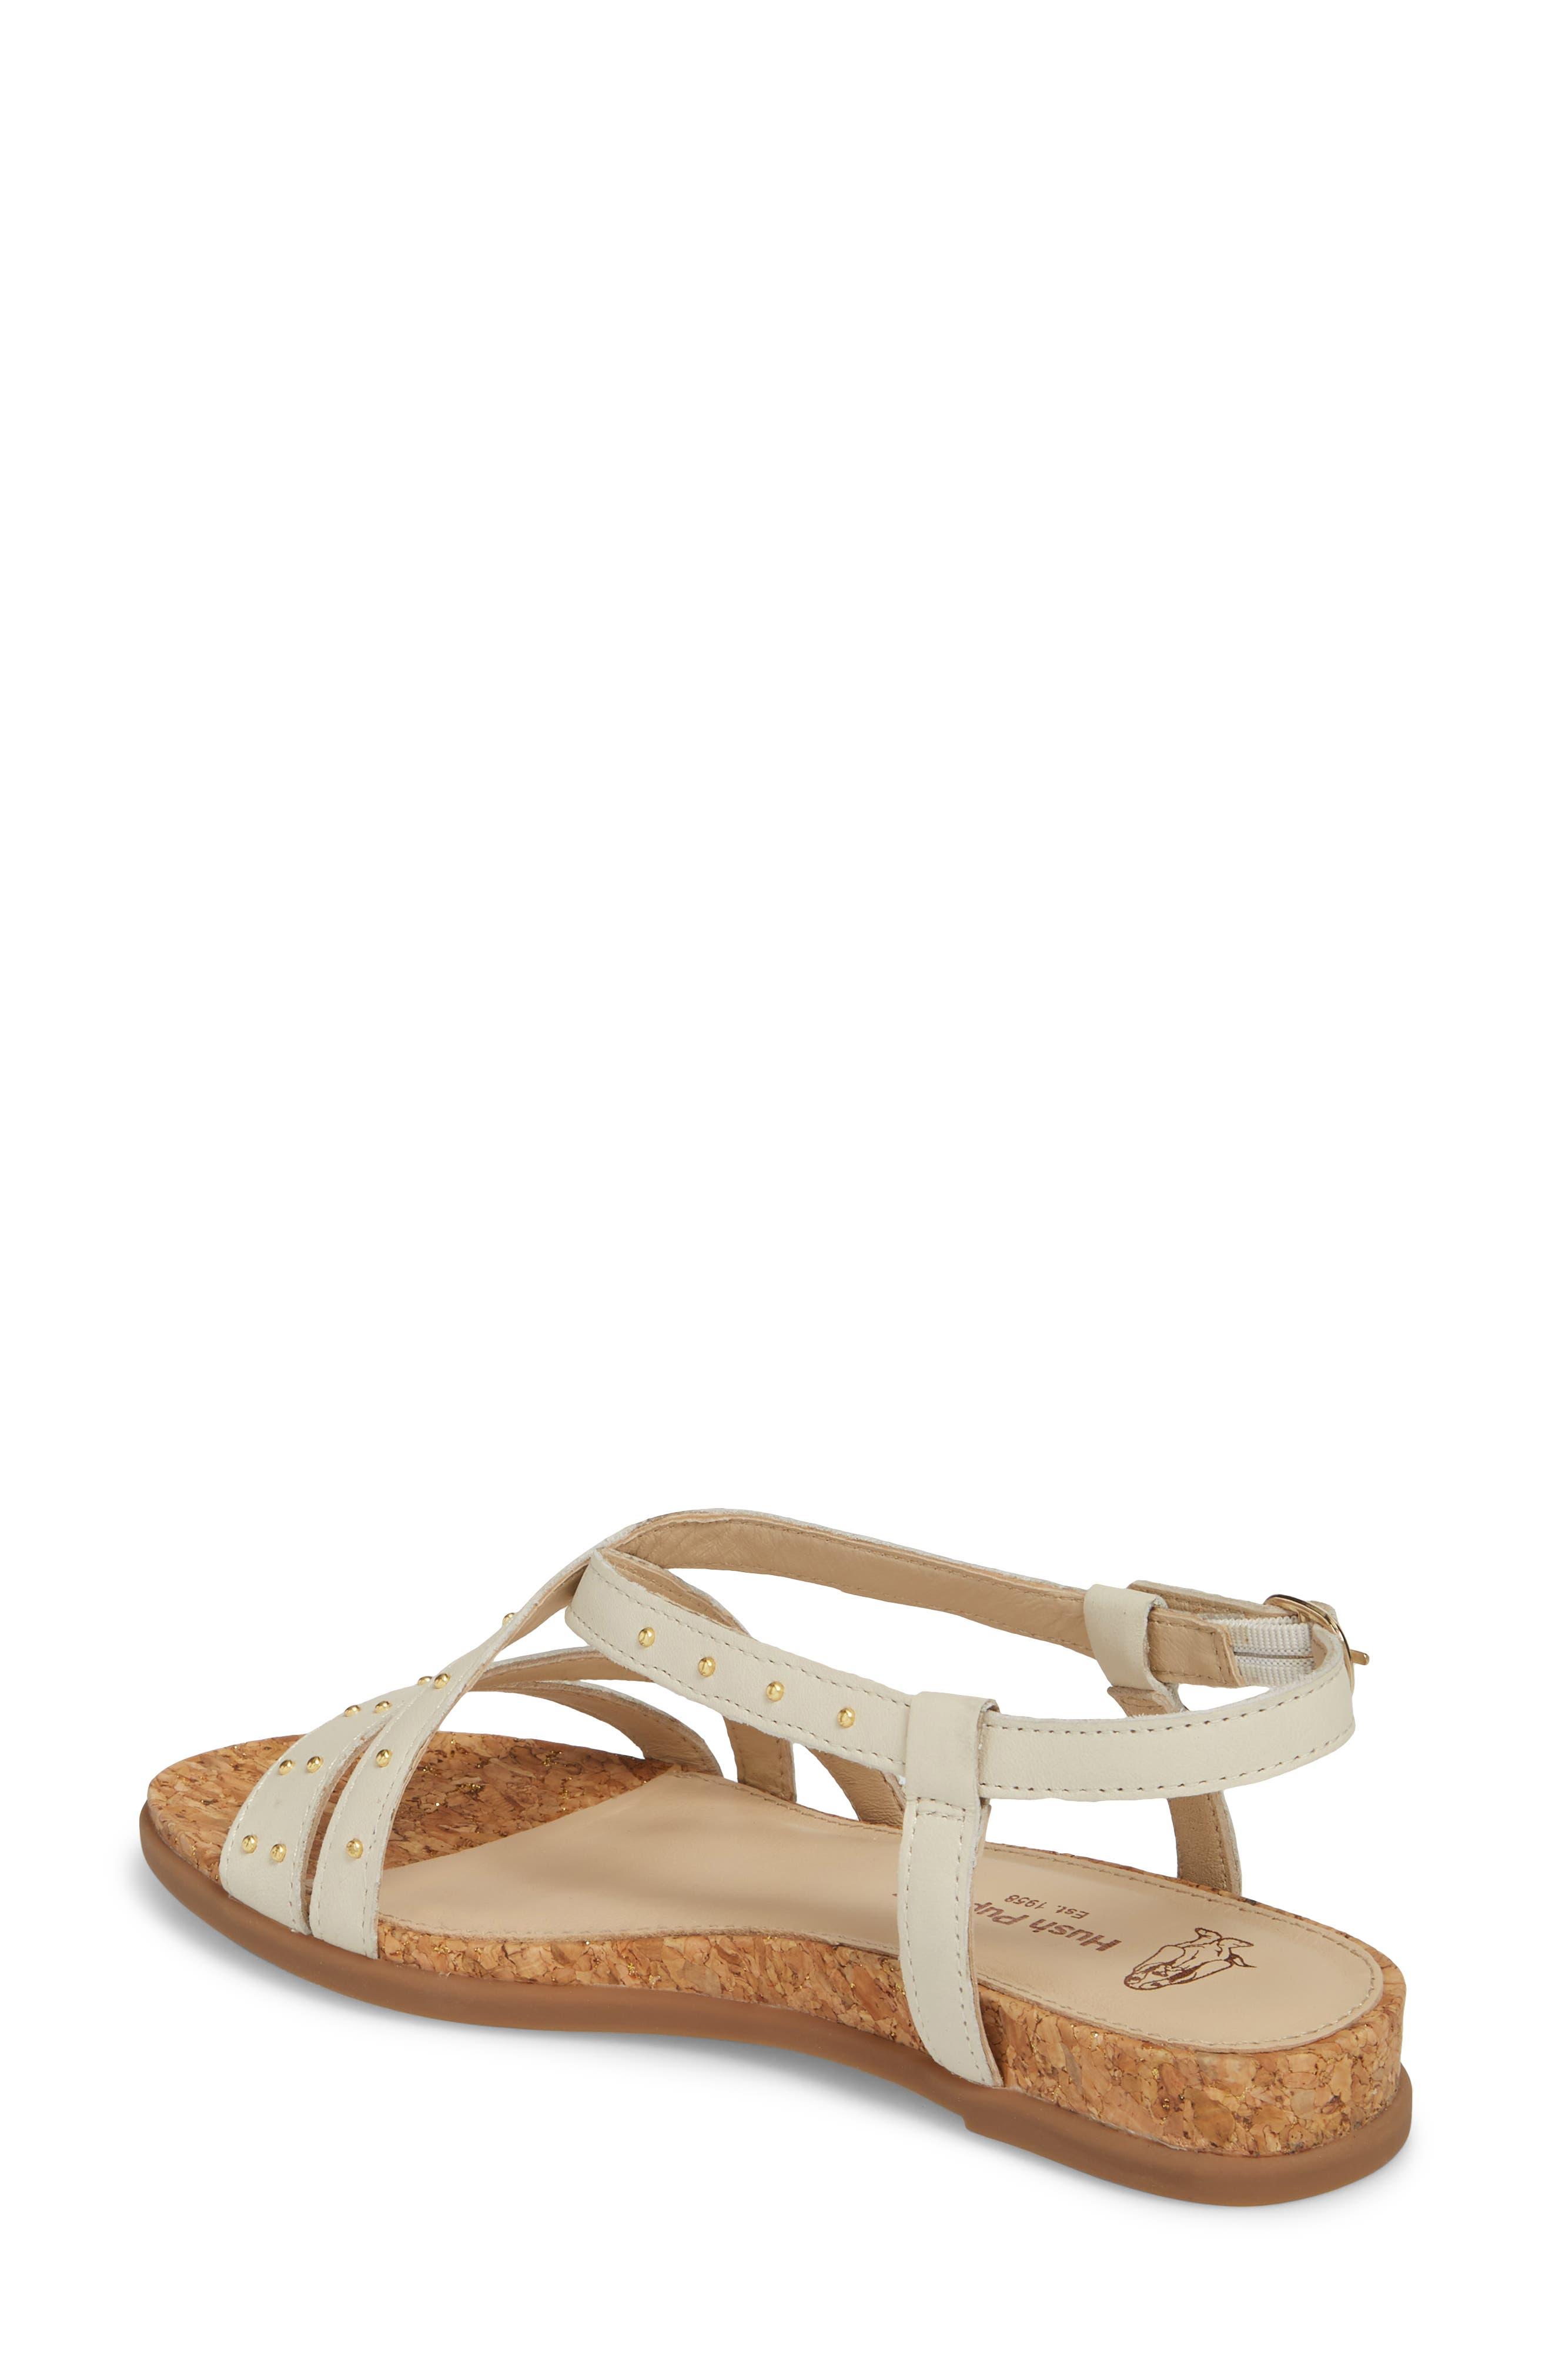 Dalmatian Studded Sandal,                             Alternate thumbnail 2, color,                             Ivory Leather